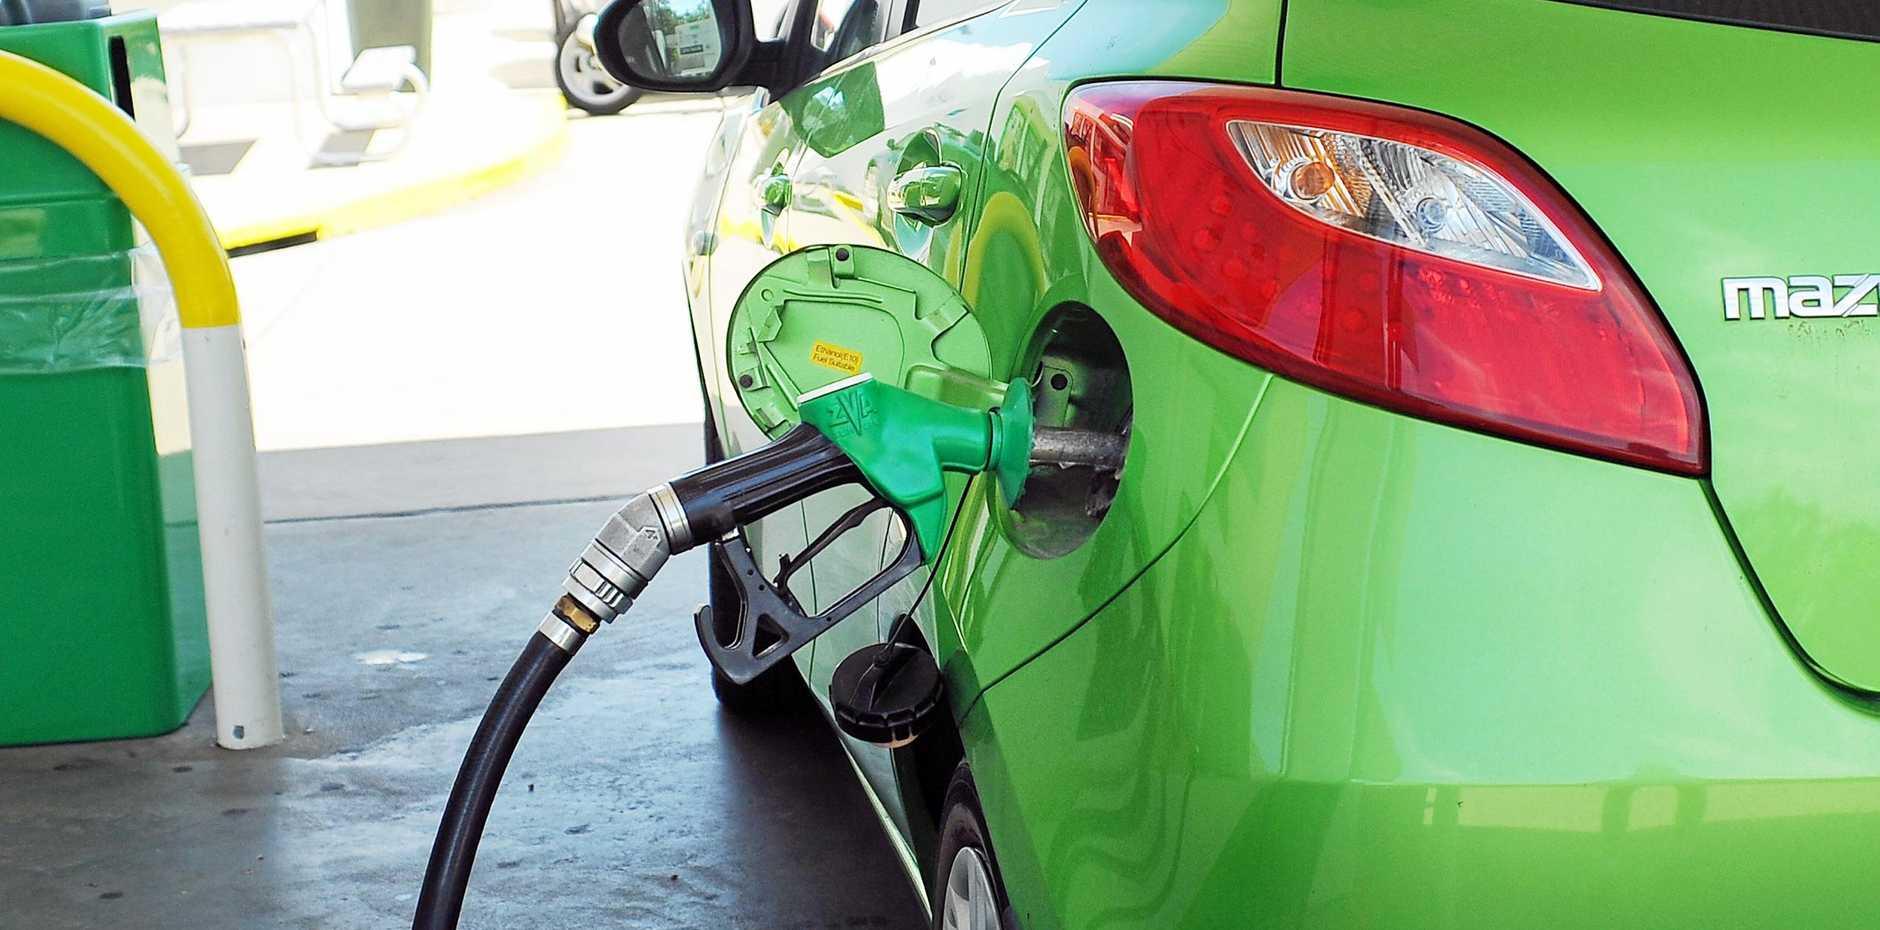 Fuel prices around Coffs Harbour.